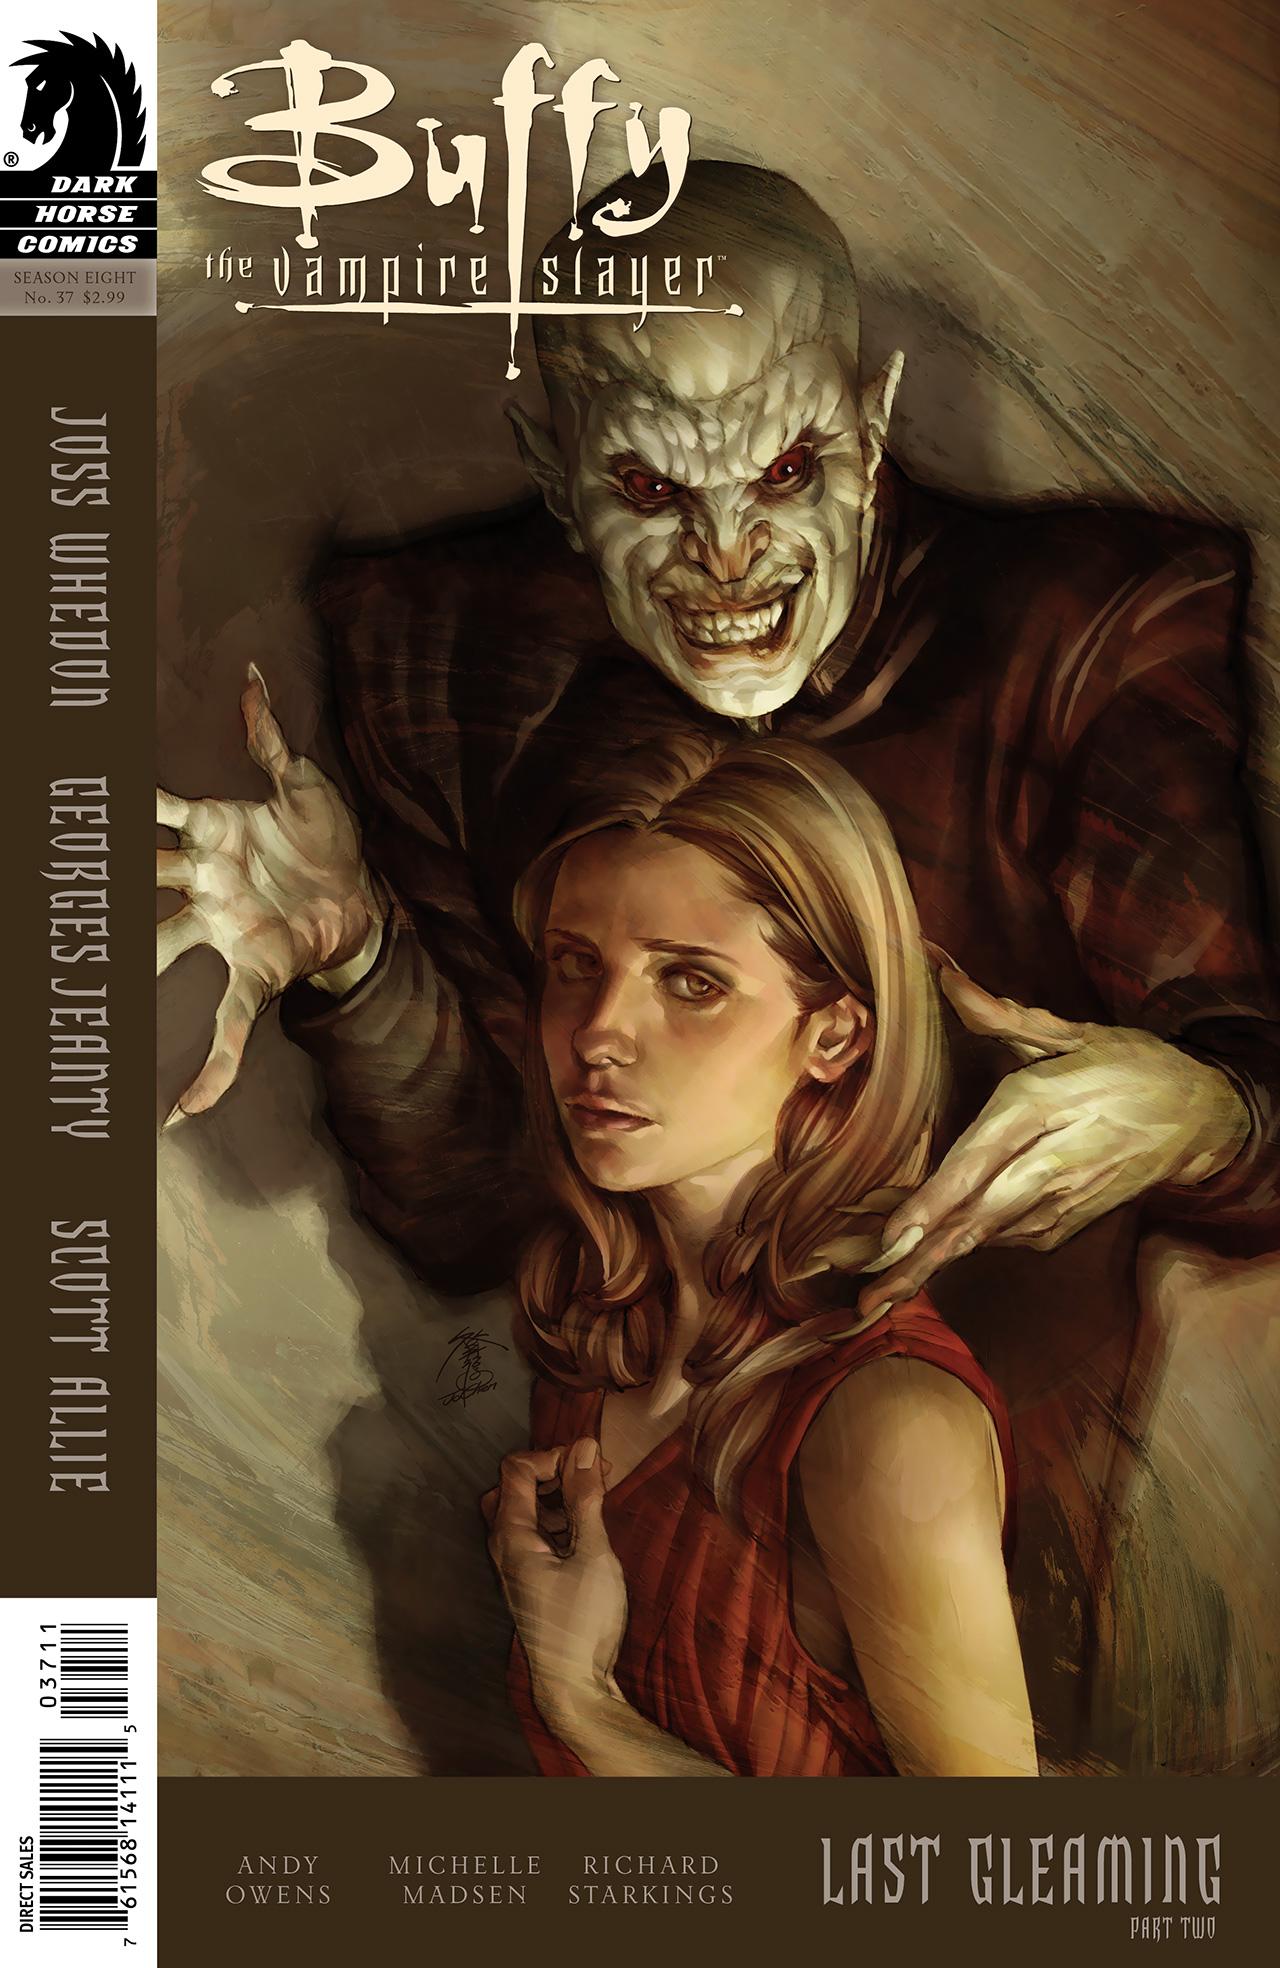 Buffy the Vampire Slayer Season Eight 37 Page 1